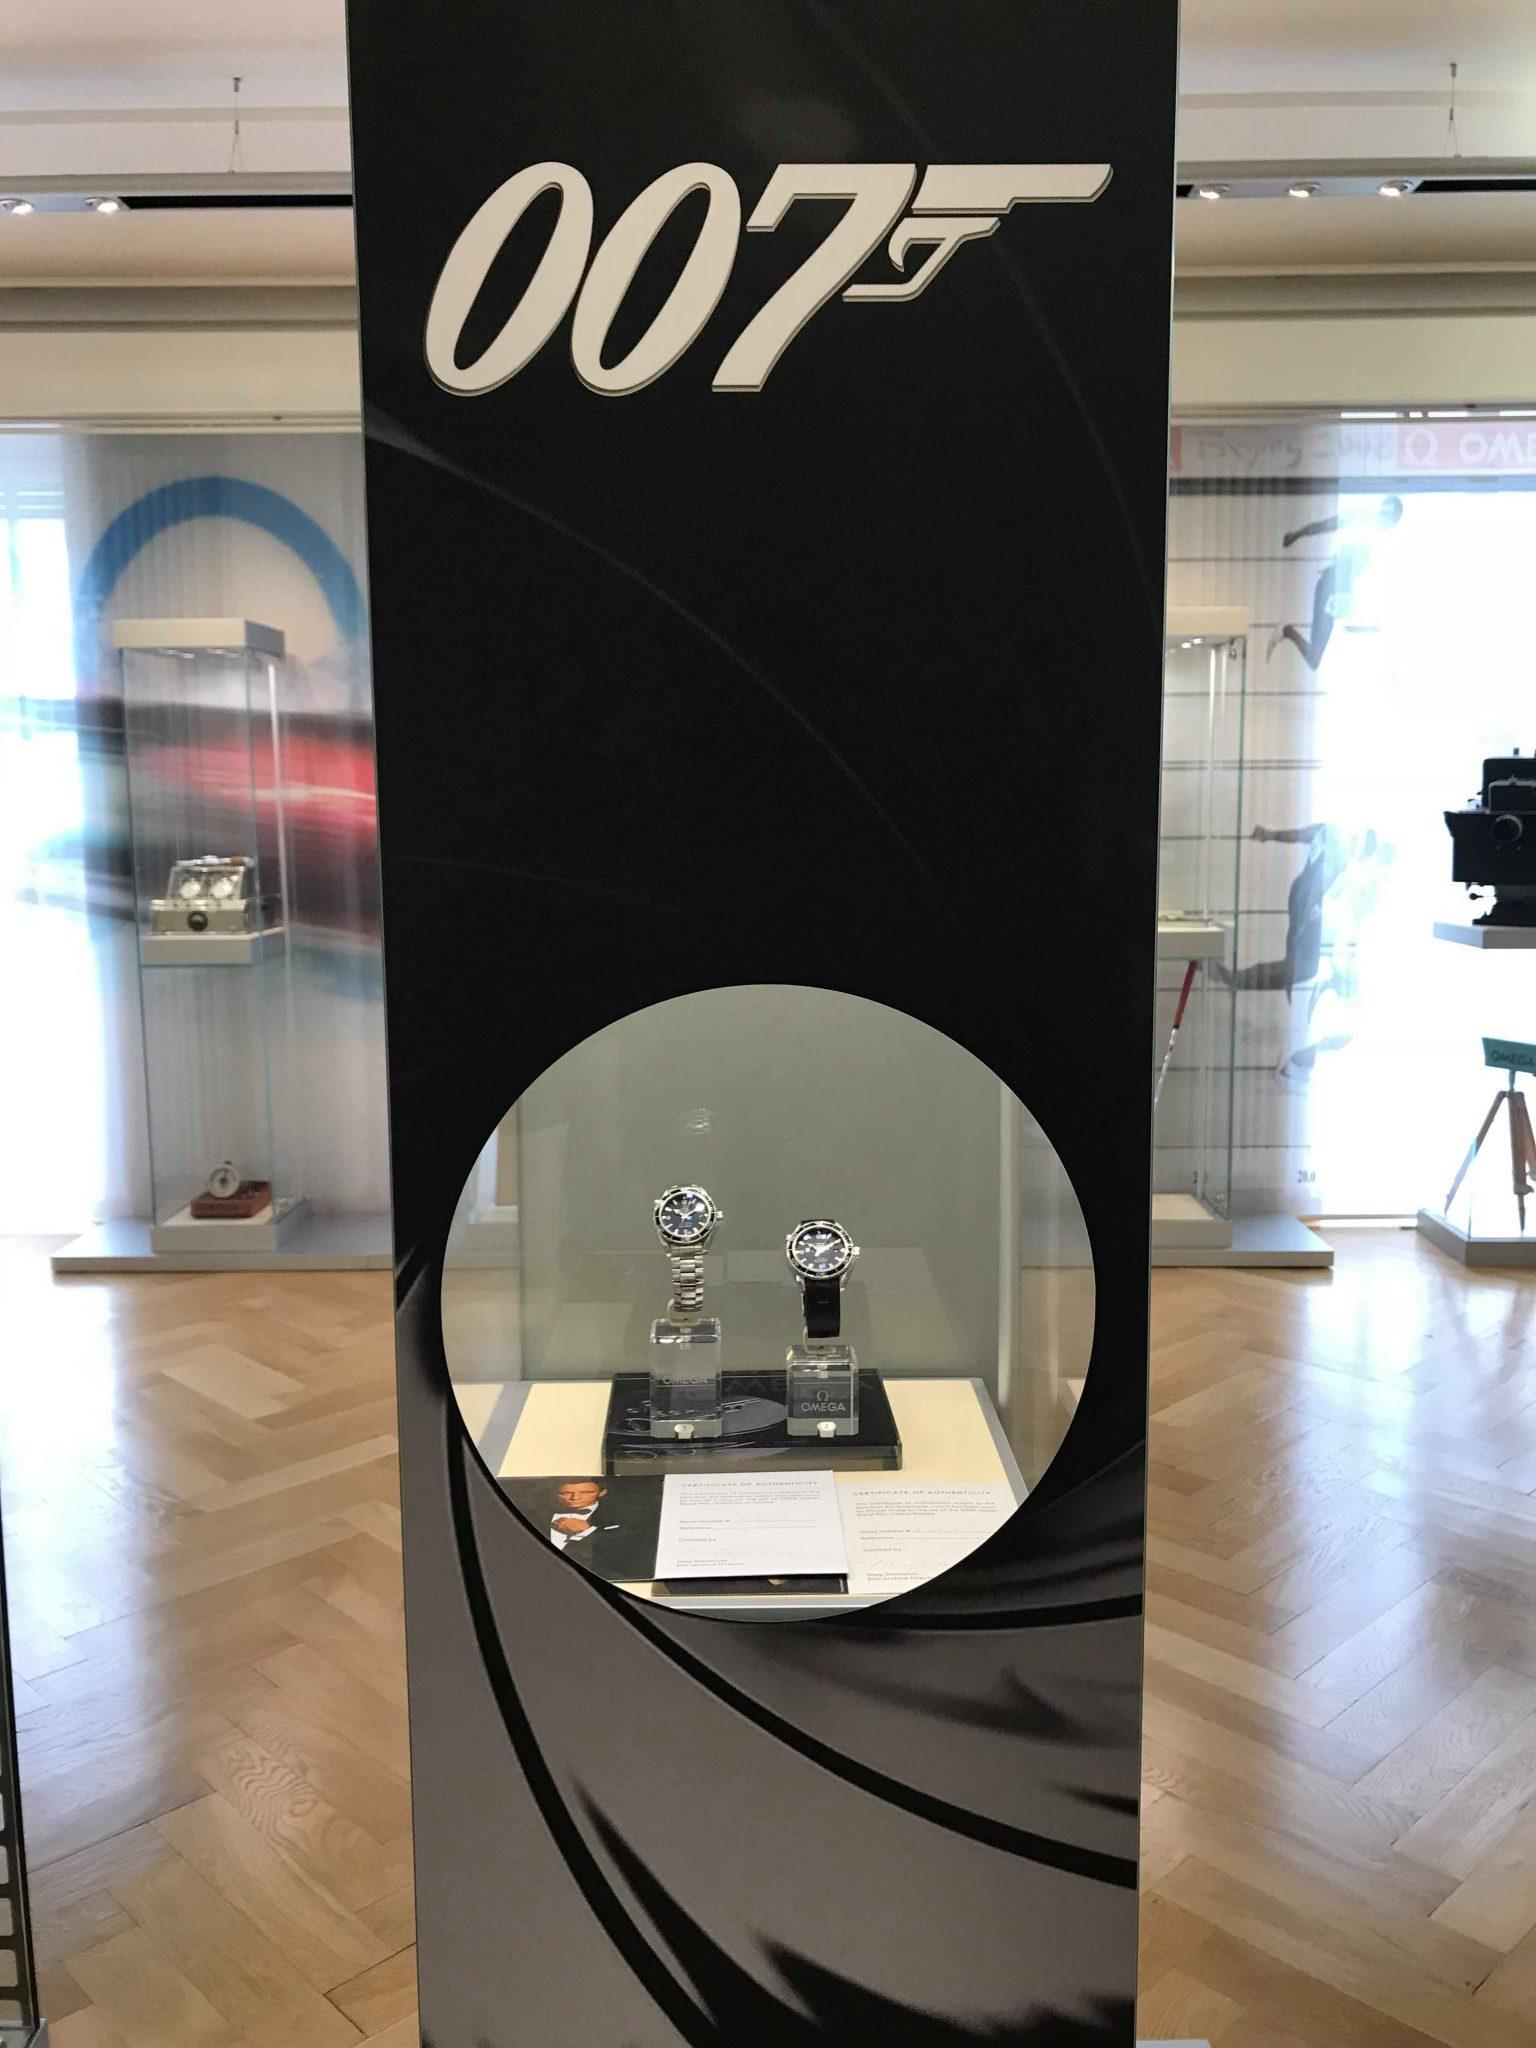 James Bond watch, Omega 007, Omega museum, Biel, Switzerland